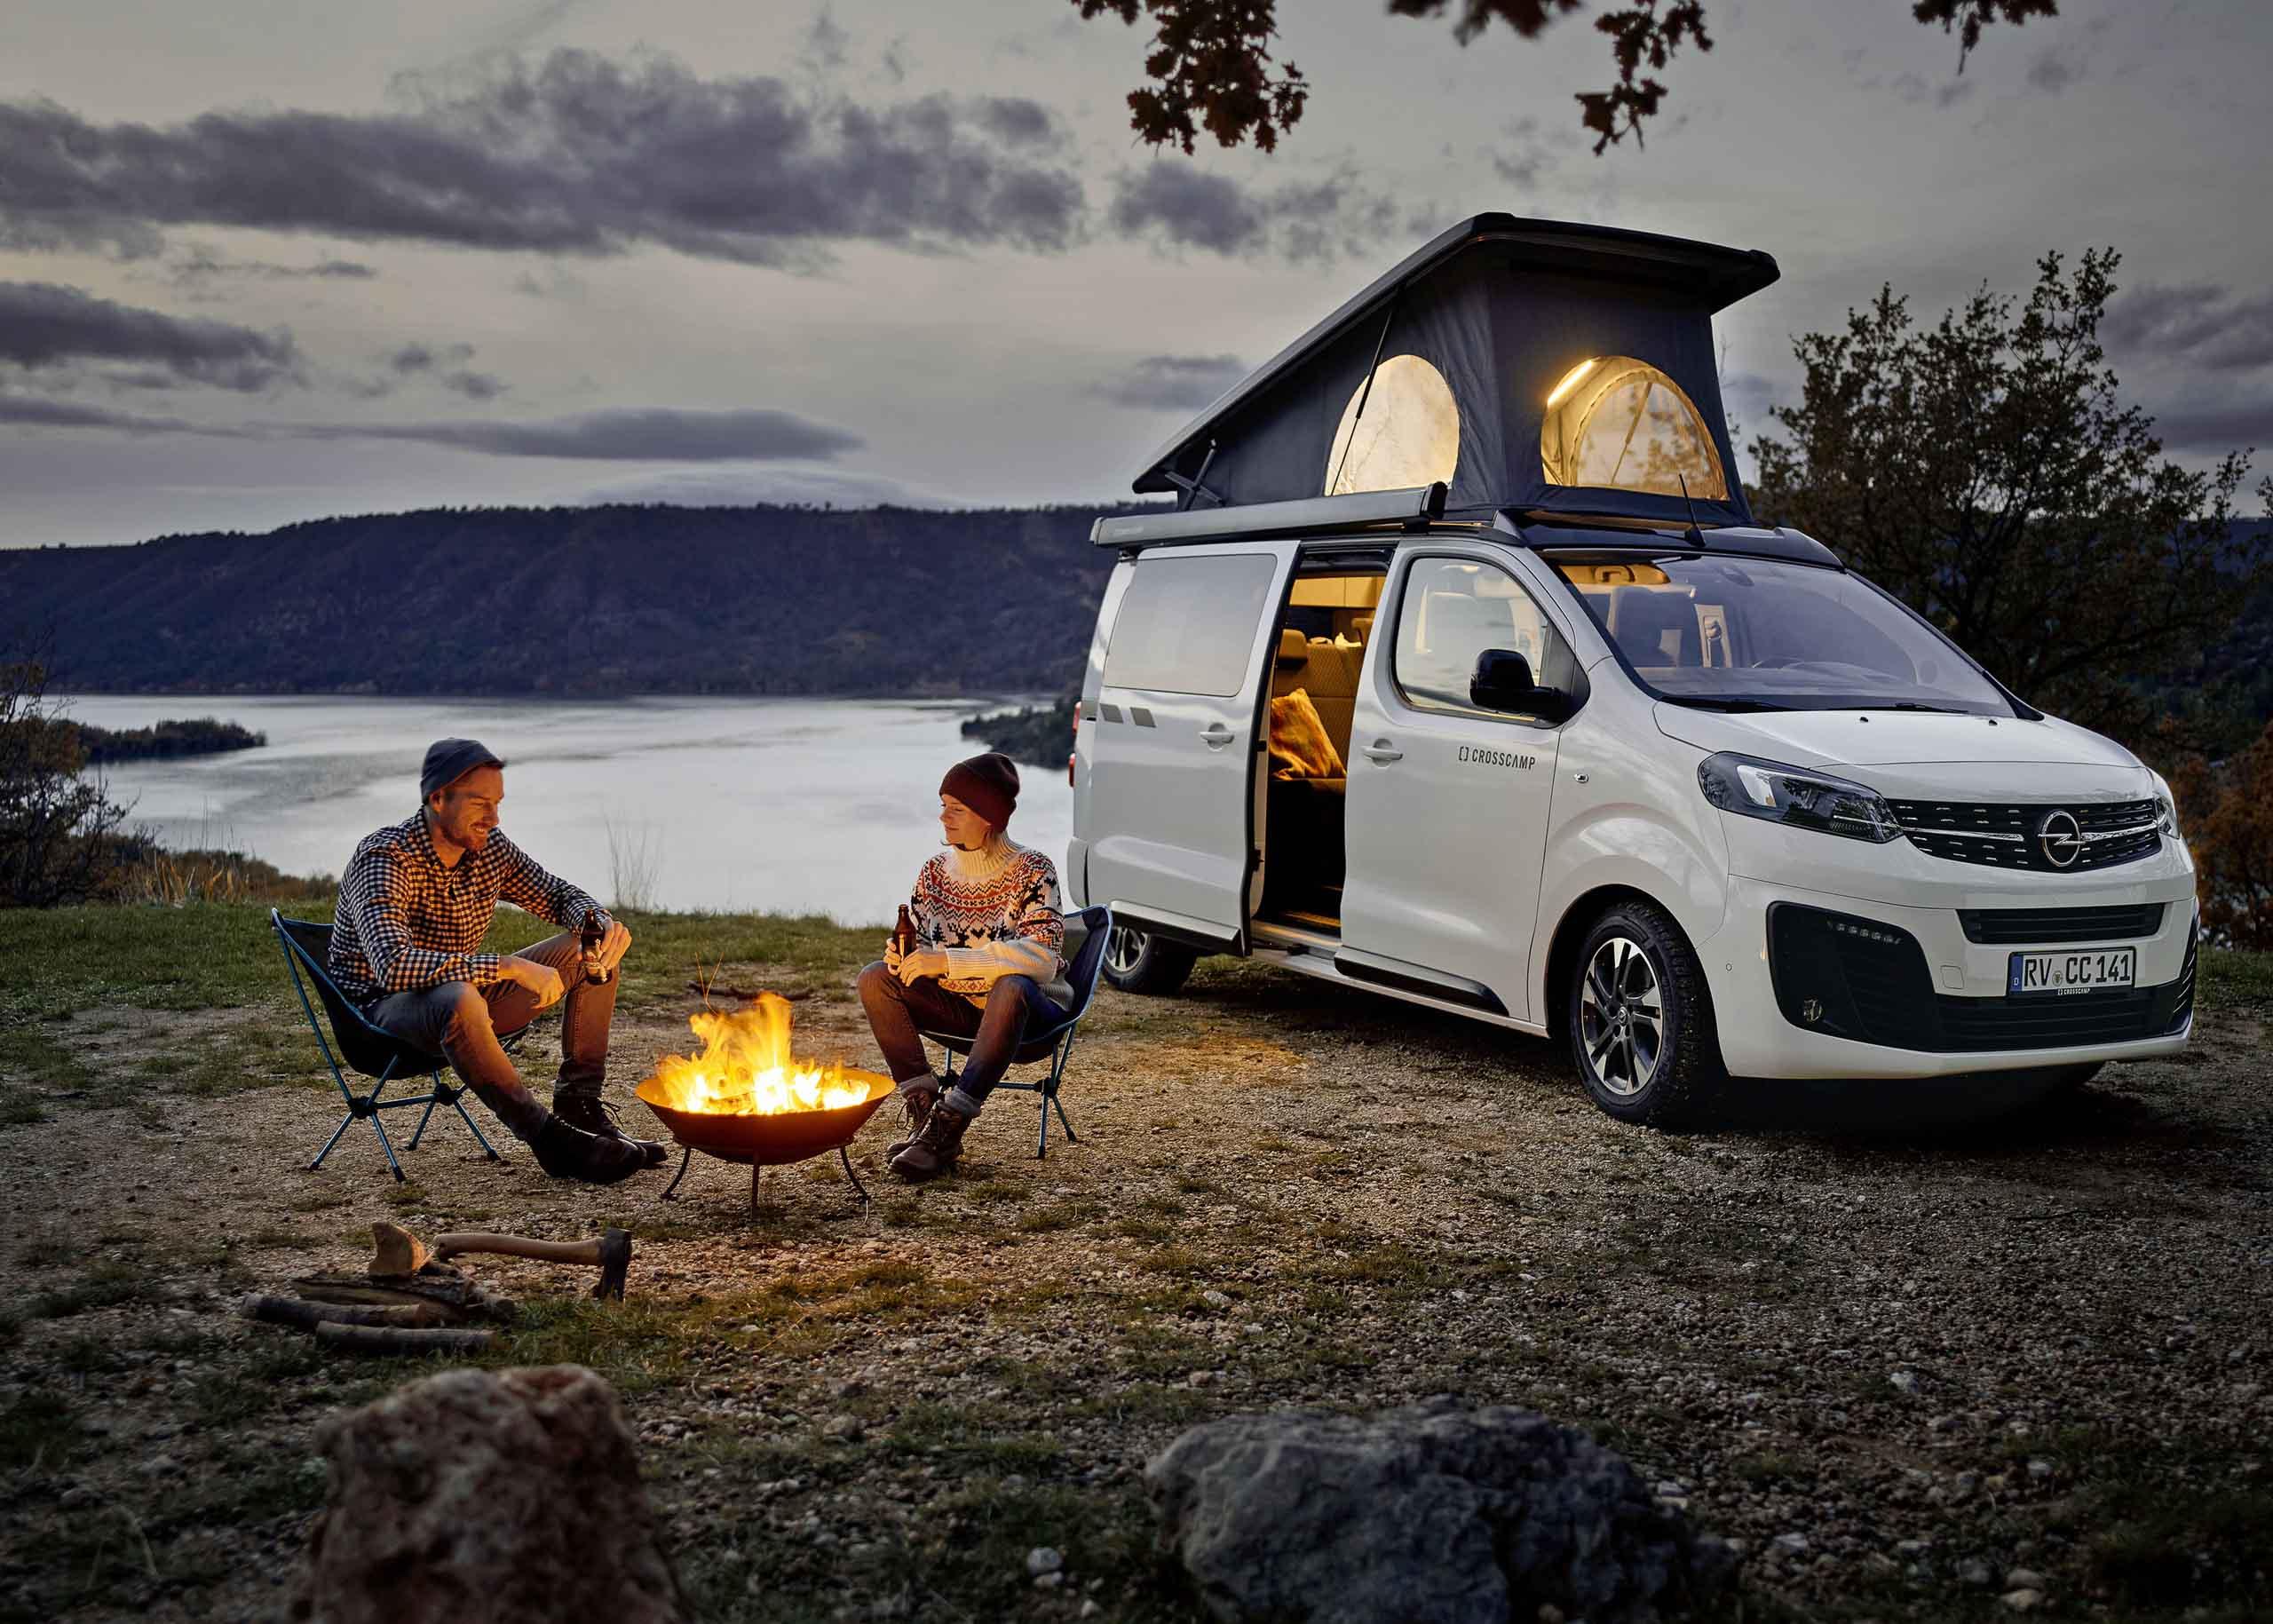 2020 Opel Zafira Crosscamp